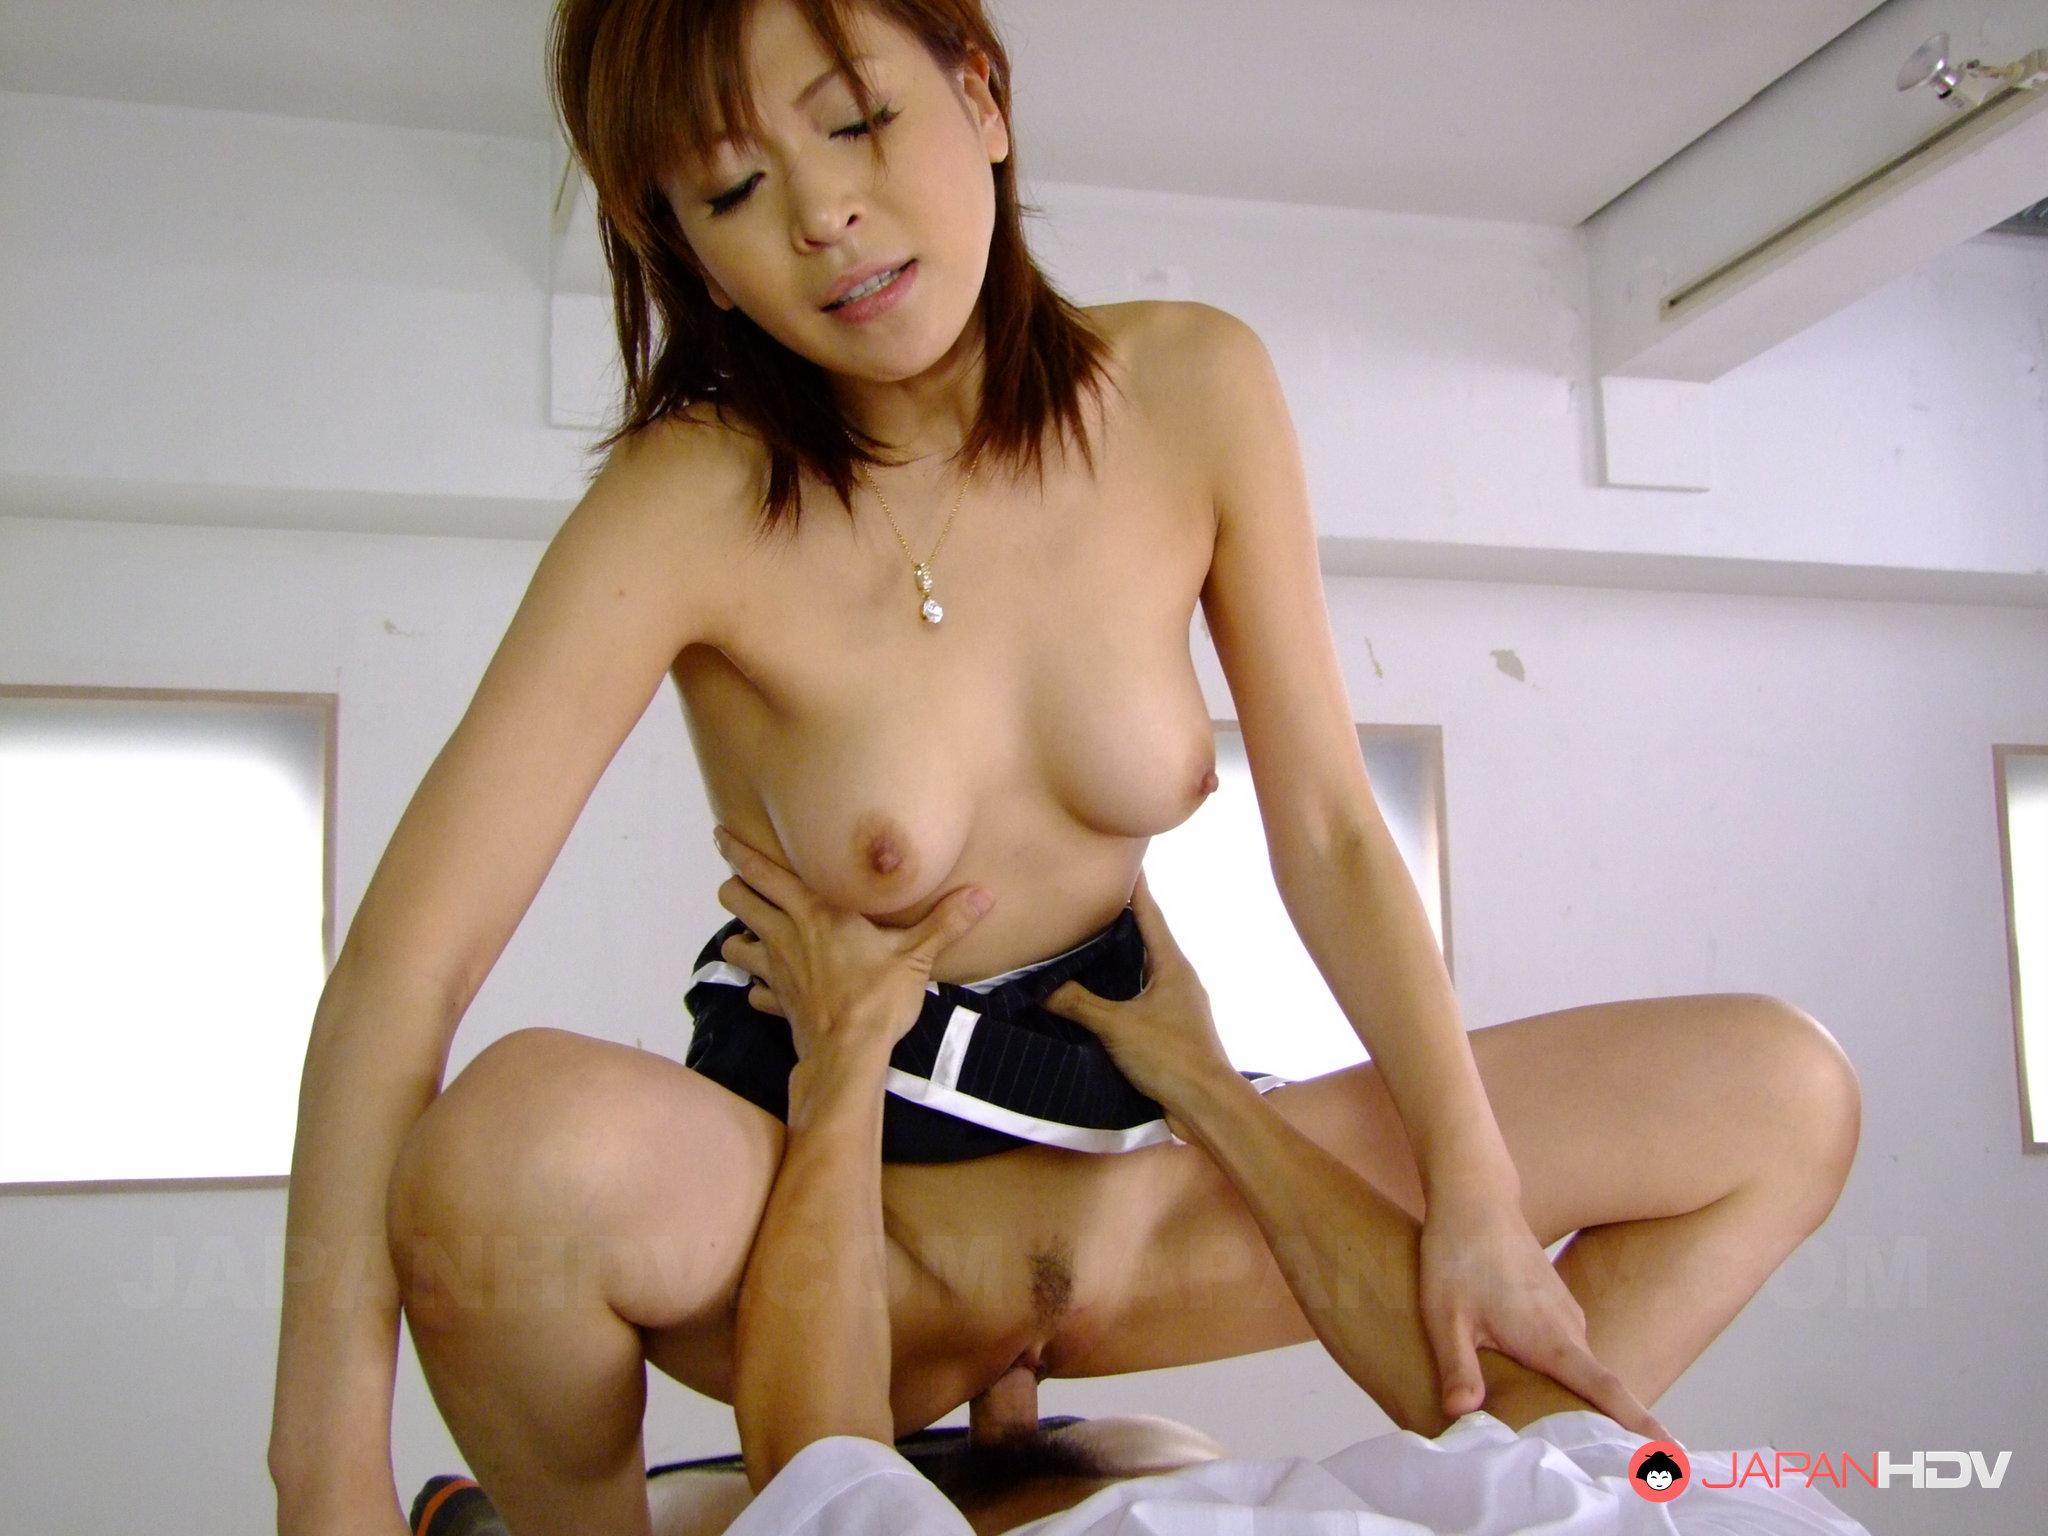 Big cock in a woman vagina